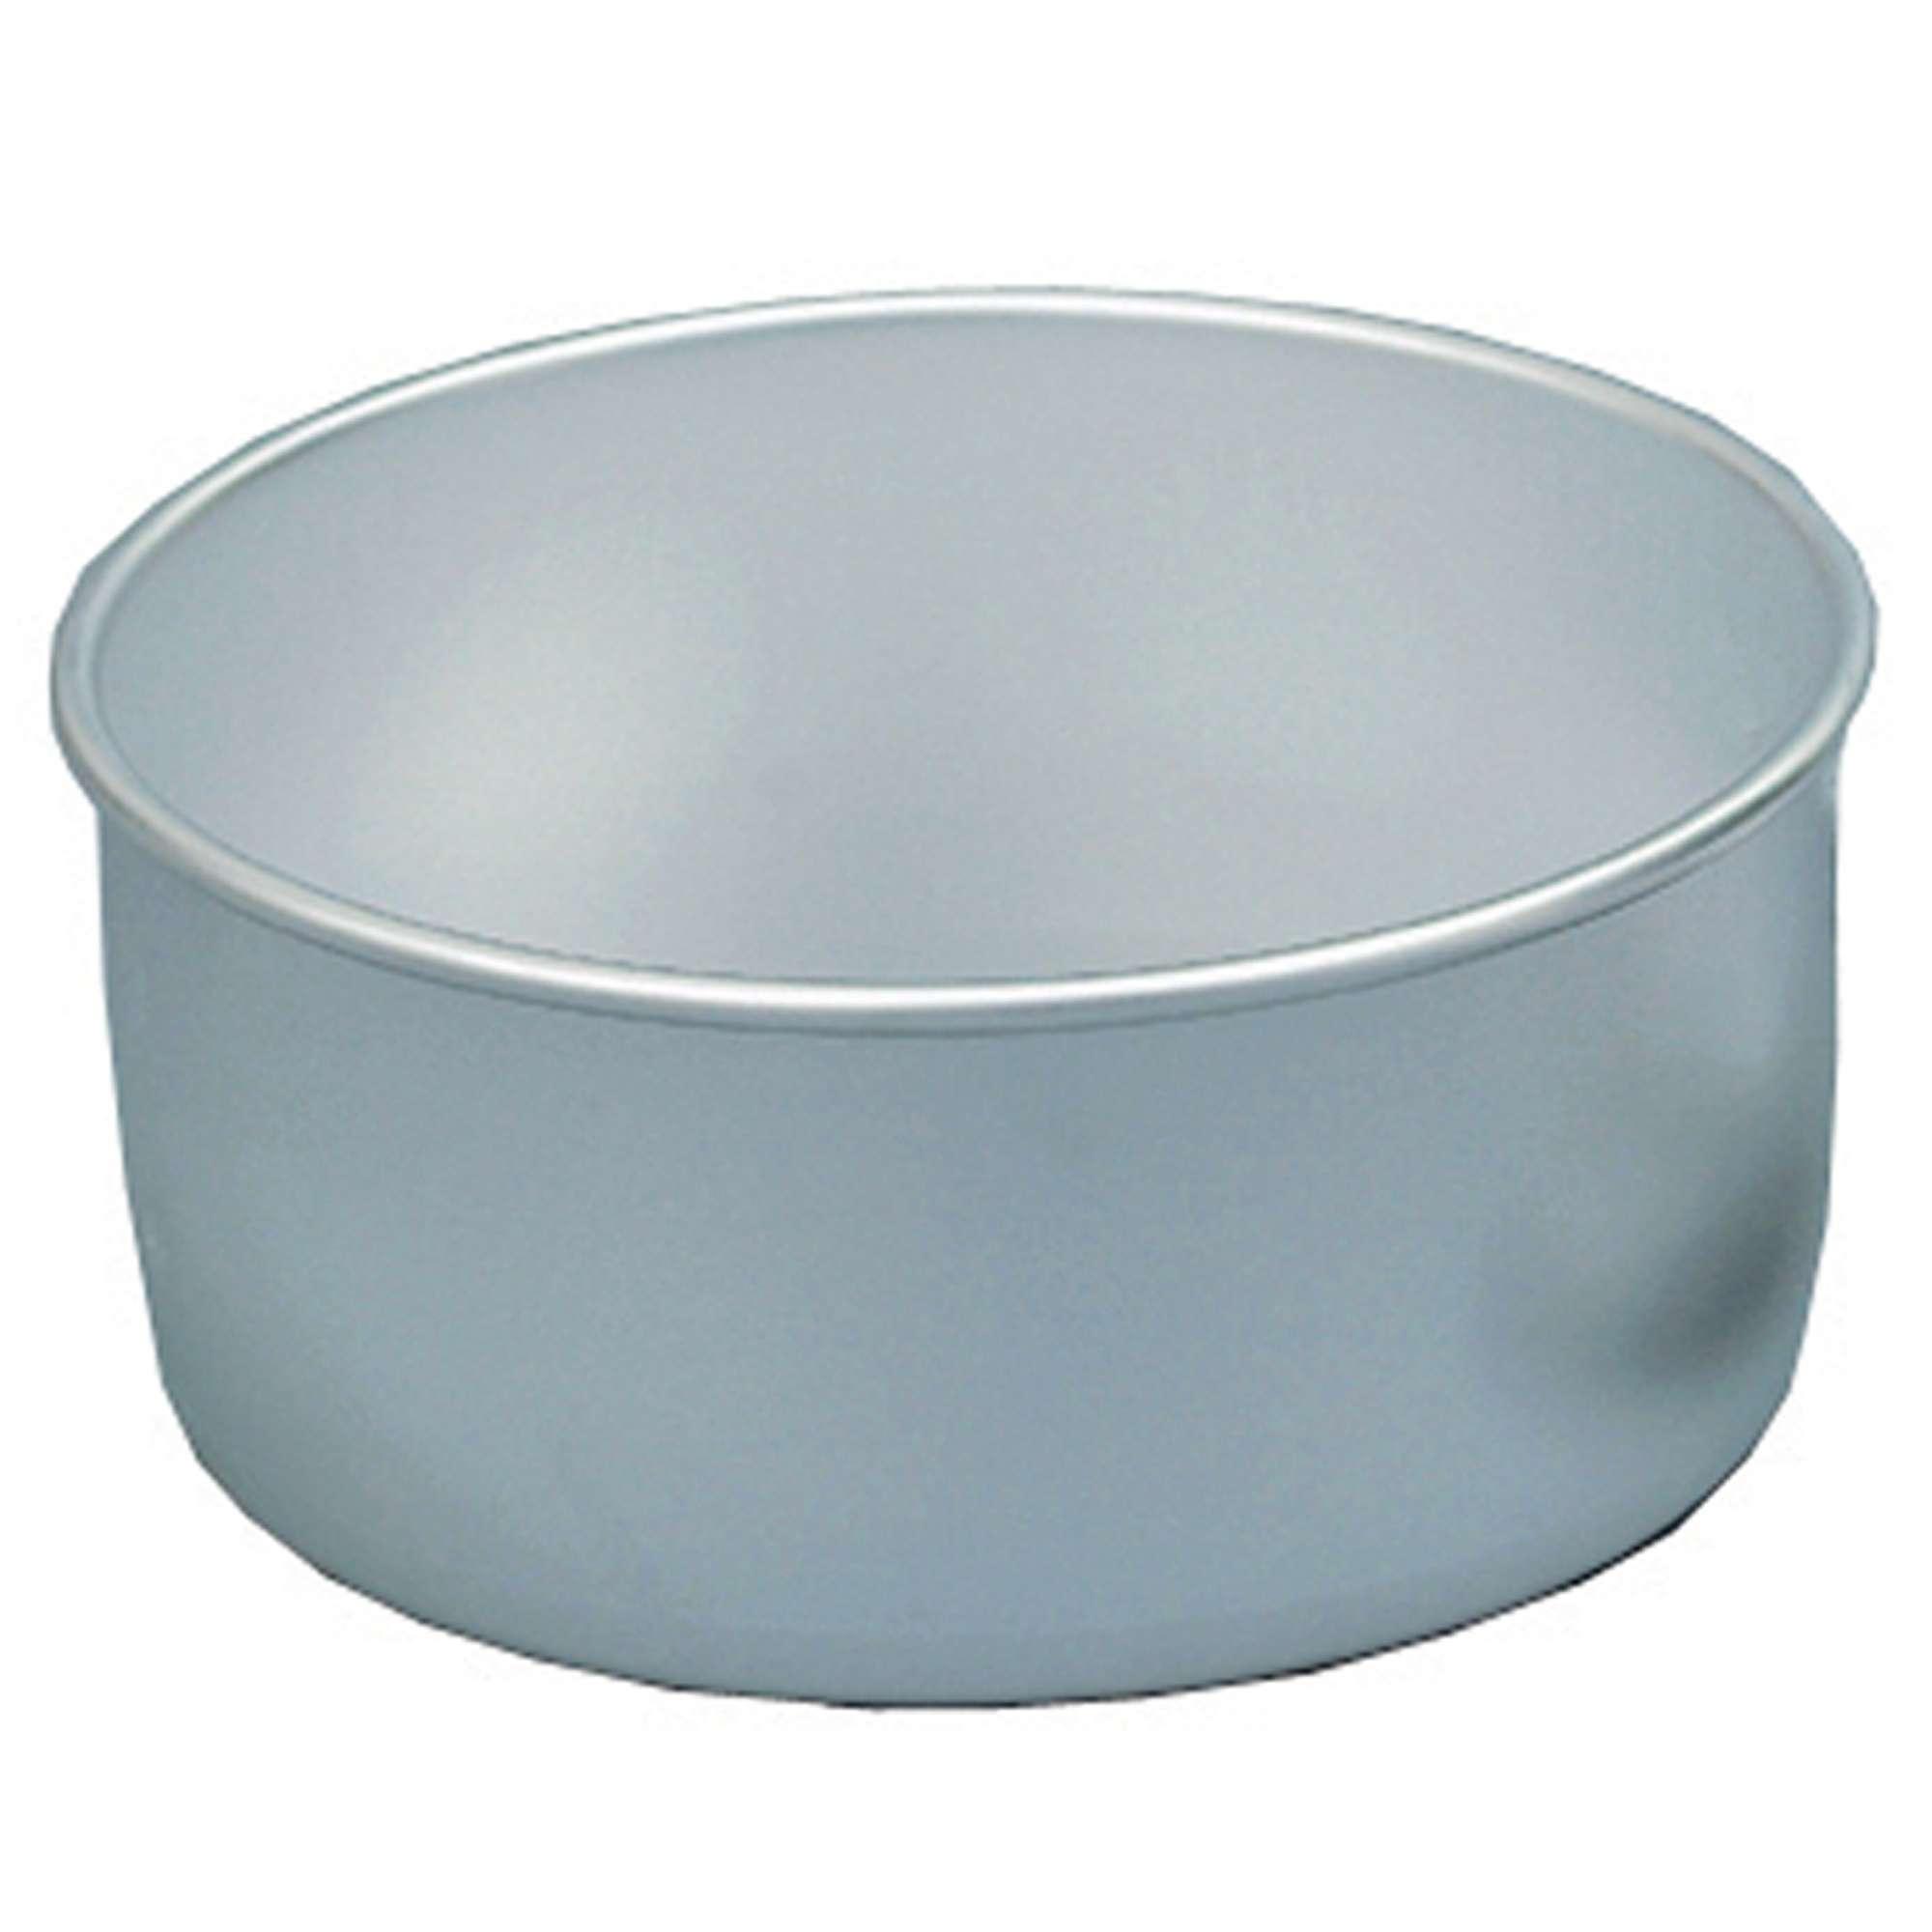 TRANGIA 1.75L Outer Aluminium Saucepan (Trangia 25 Series)